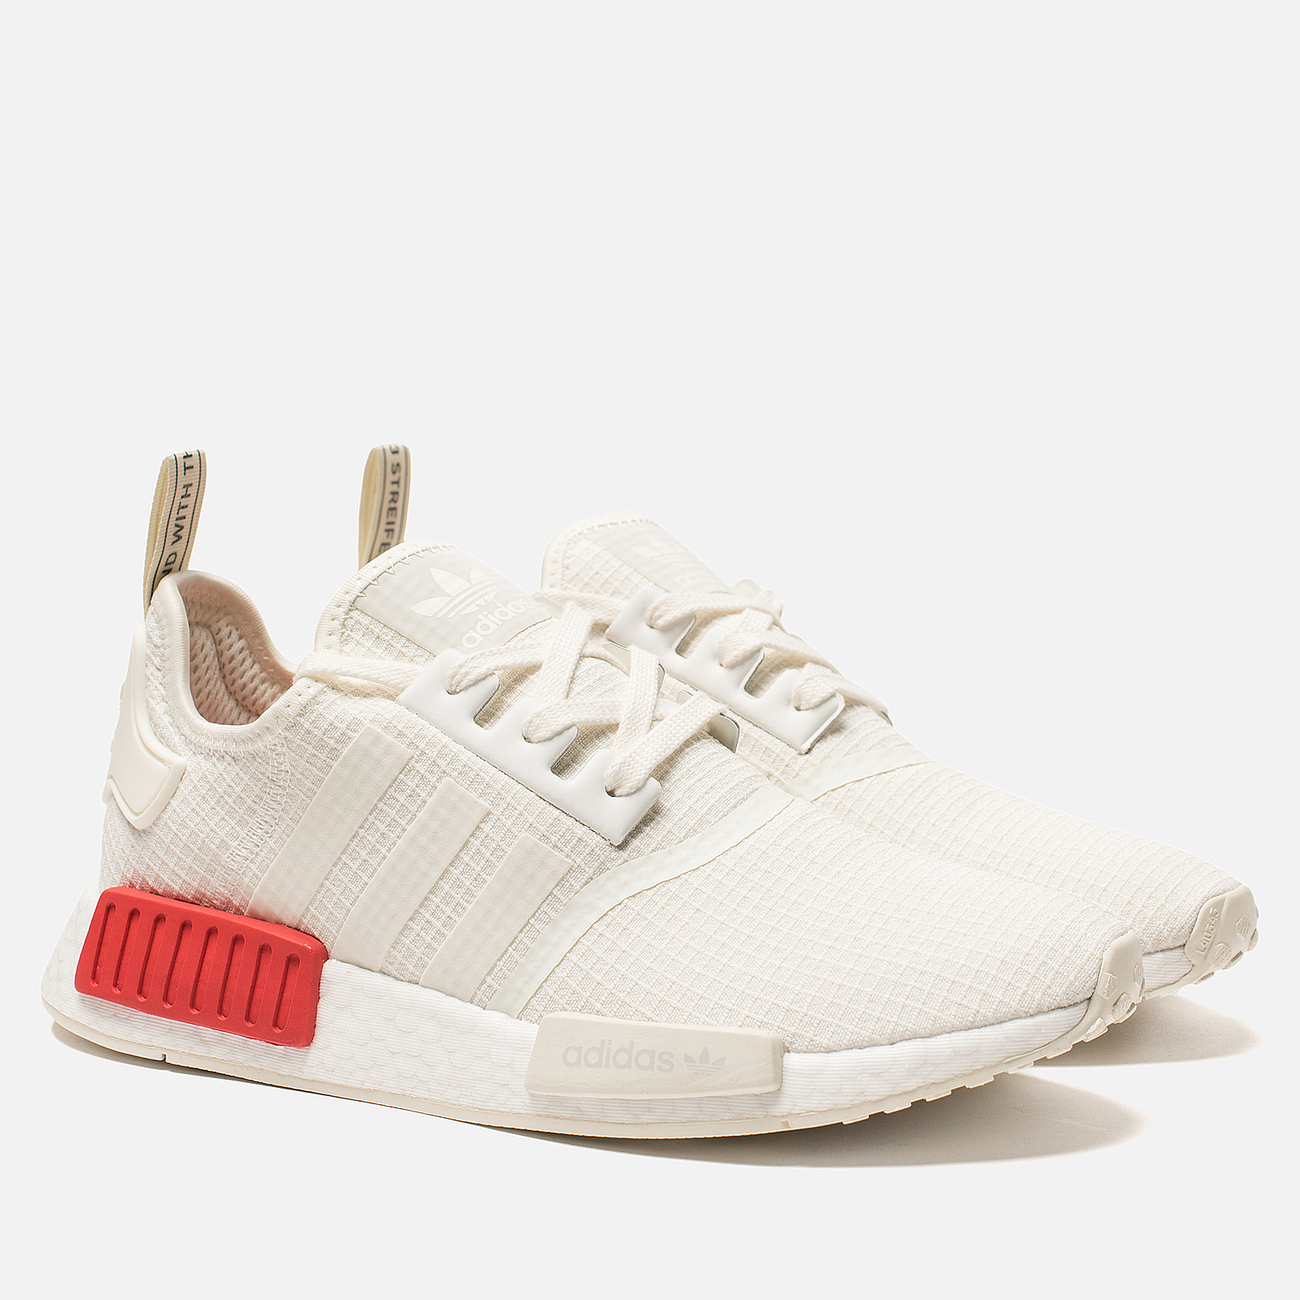 Кроссовки adidas Originals NMD R1 Off White/Off White/Lush Red